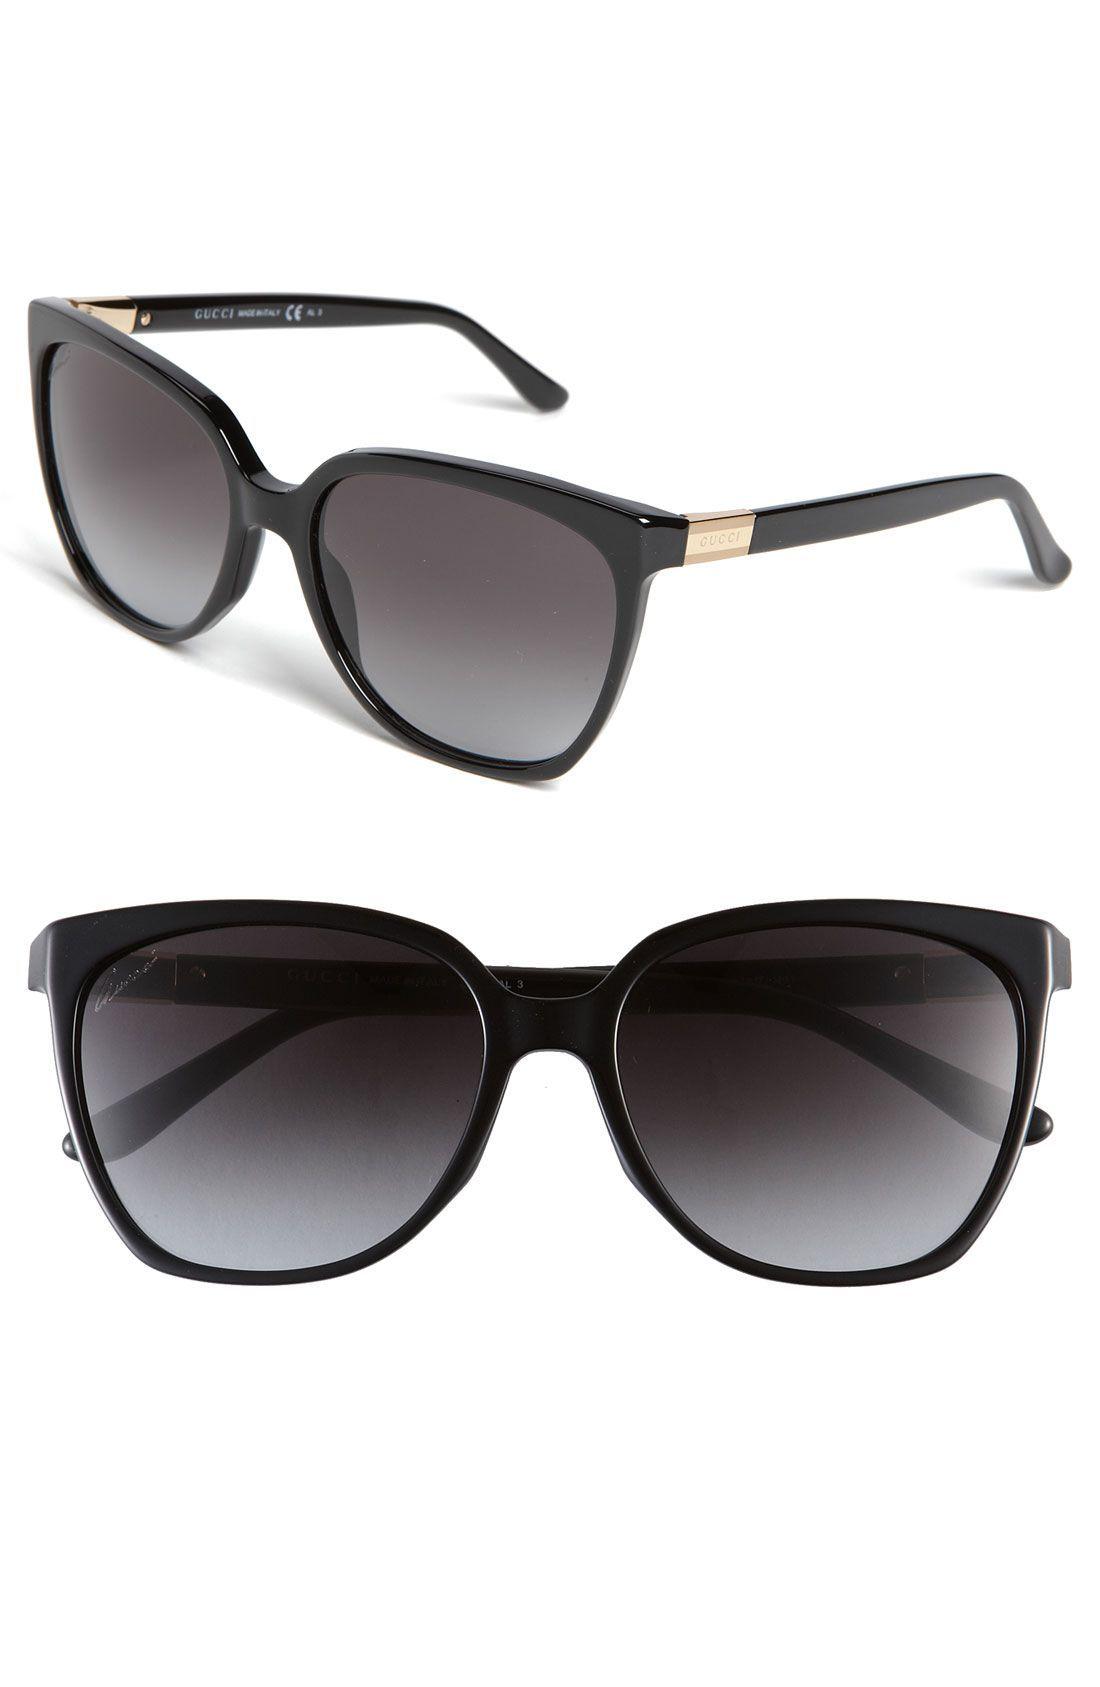 77c699b731b39 Gucci 57mm Oversized Sunglasses - black OR havana  )